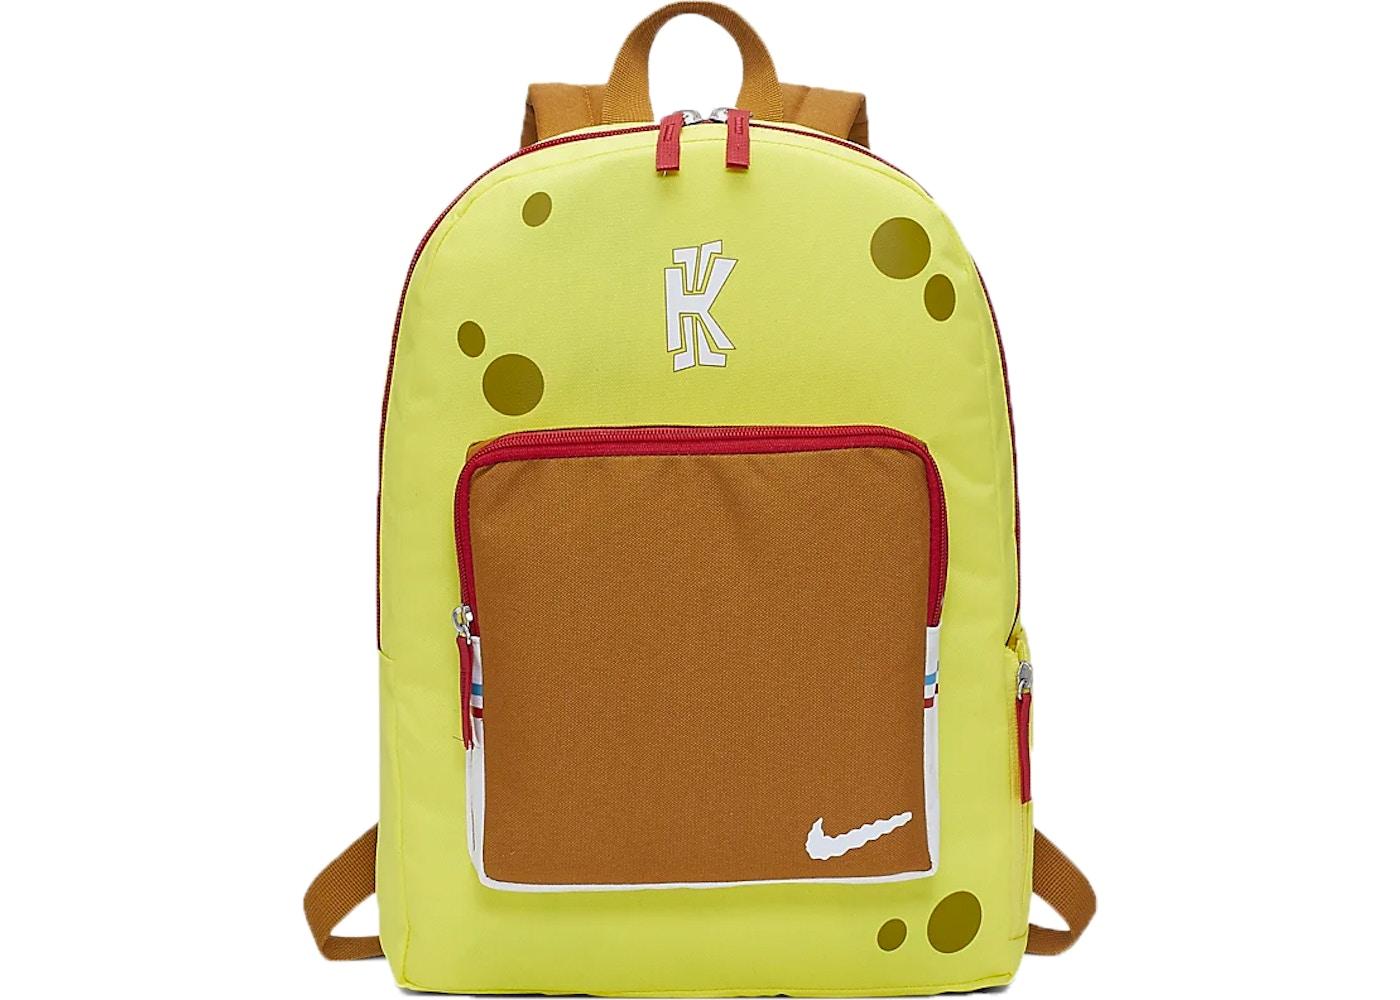 construir Pino huevo  Nike Kyrie x Spongebob Backpack Dynamic Yellow - SS19